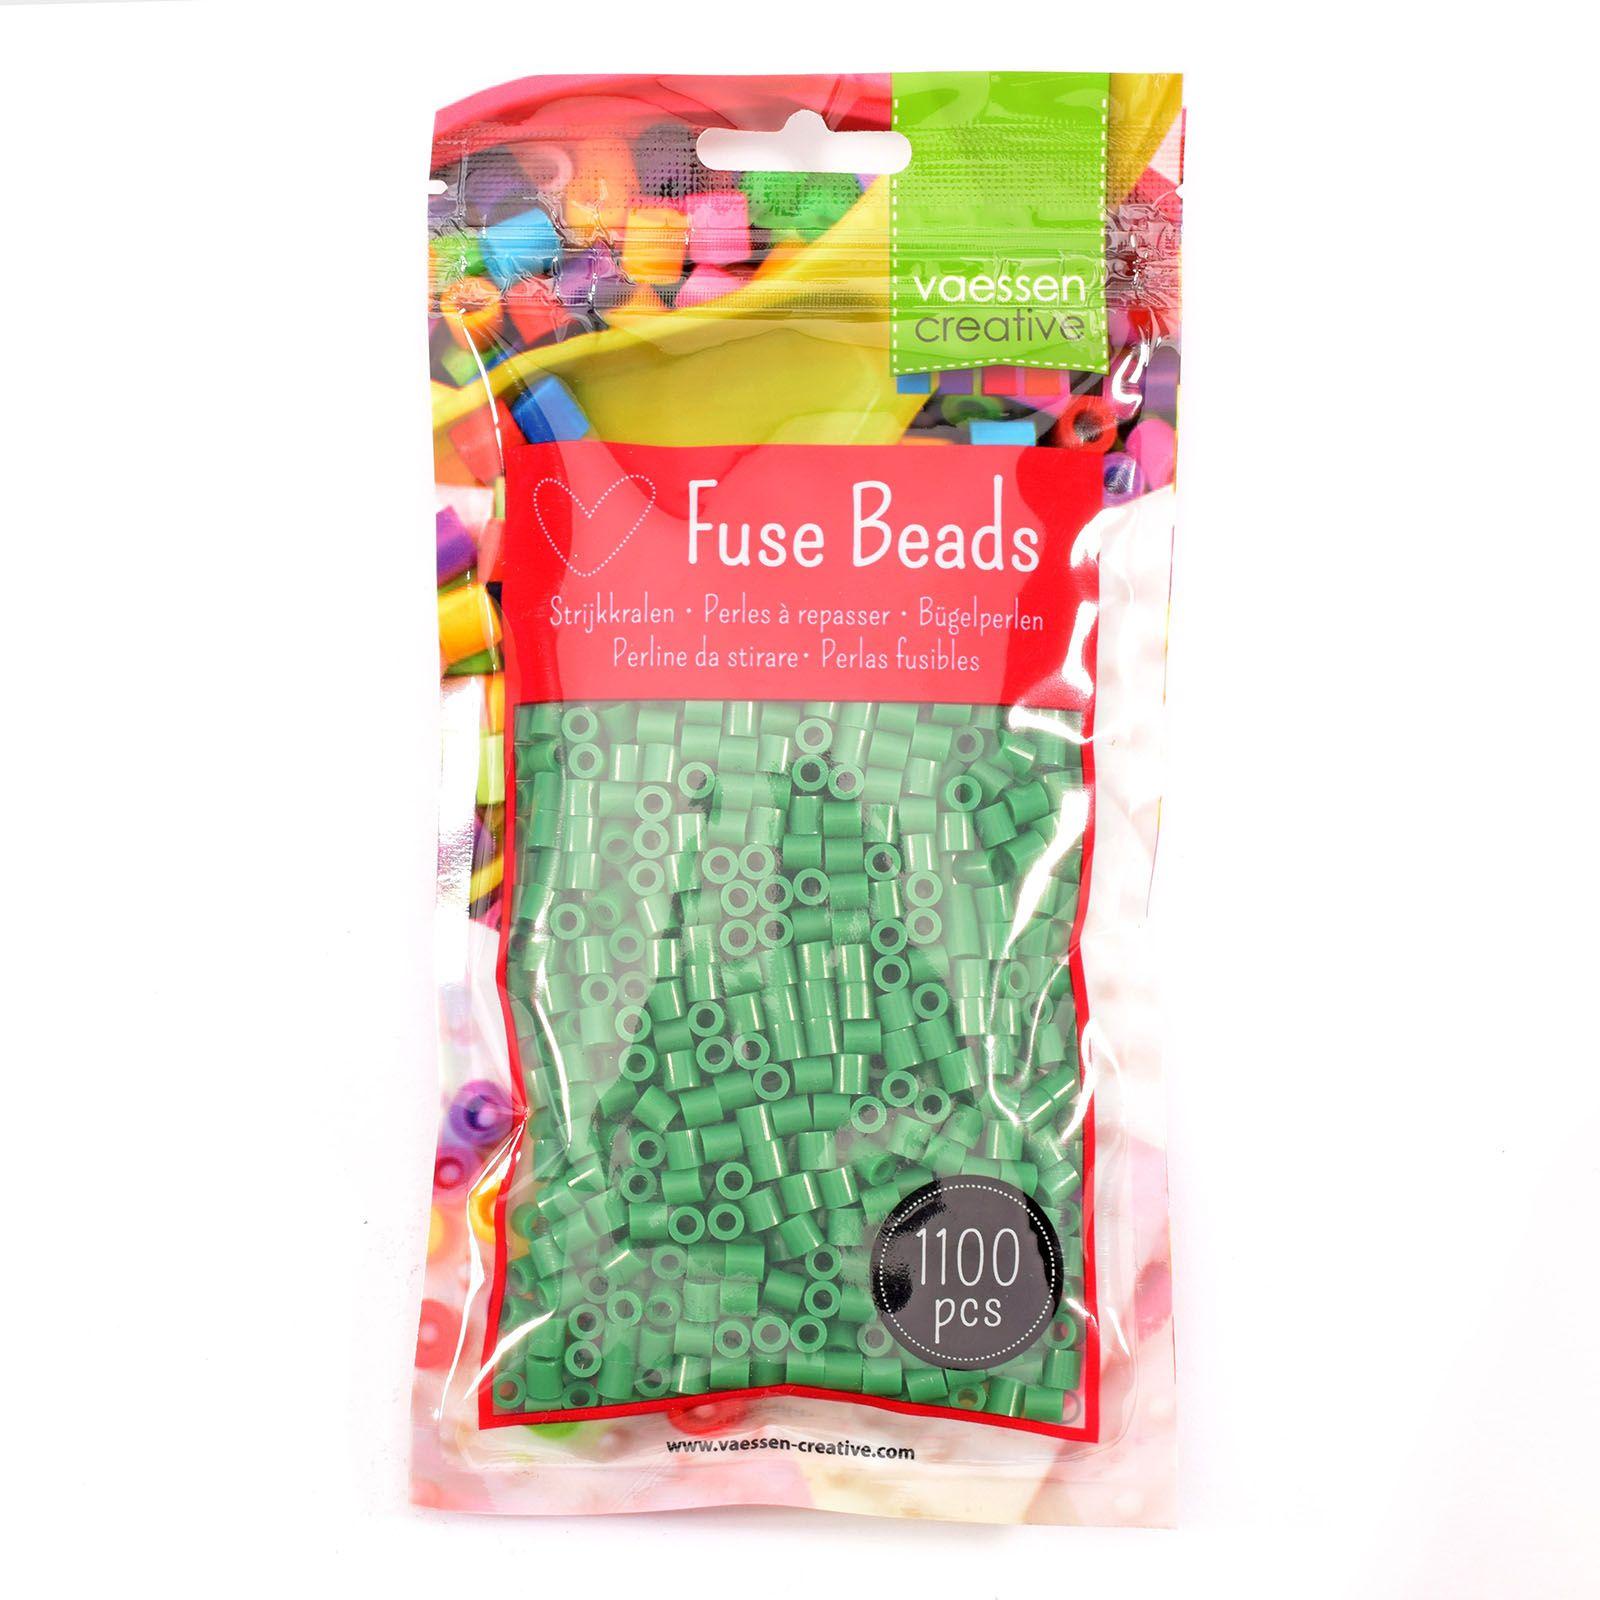 Sachet de 1100 perles à repasser - Ø 5 mm Coloris vert